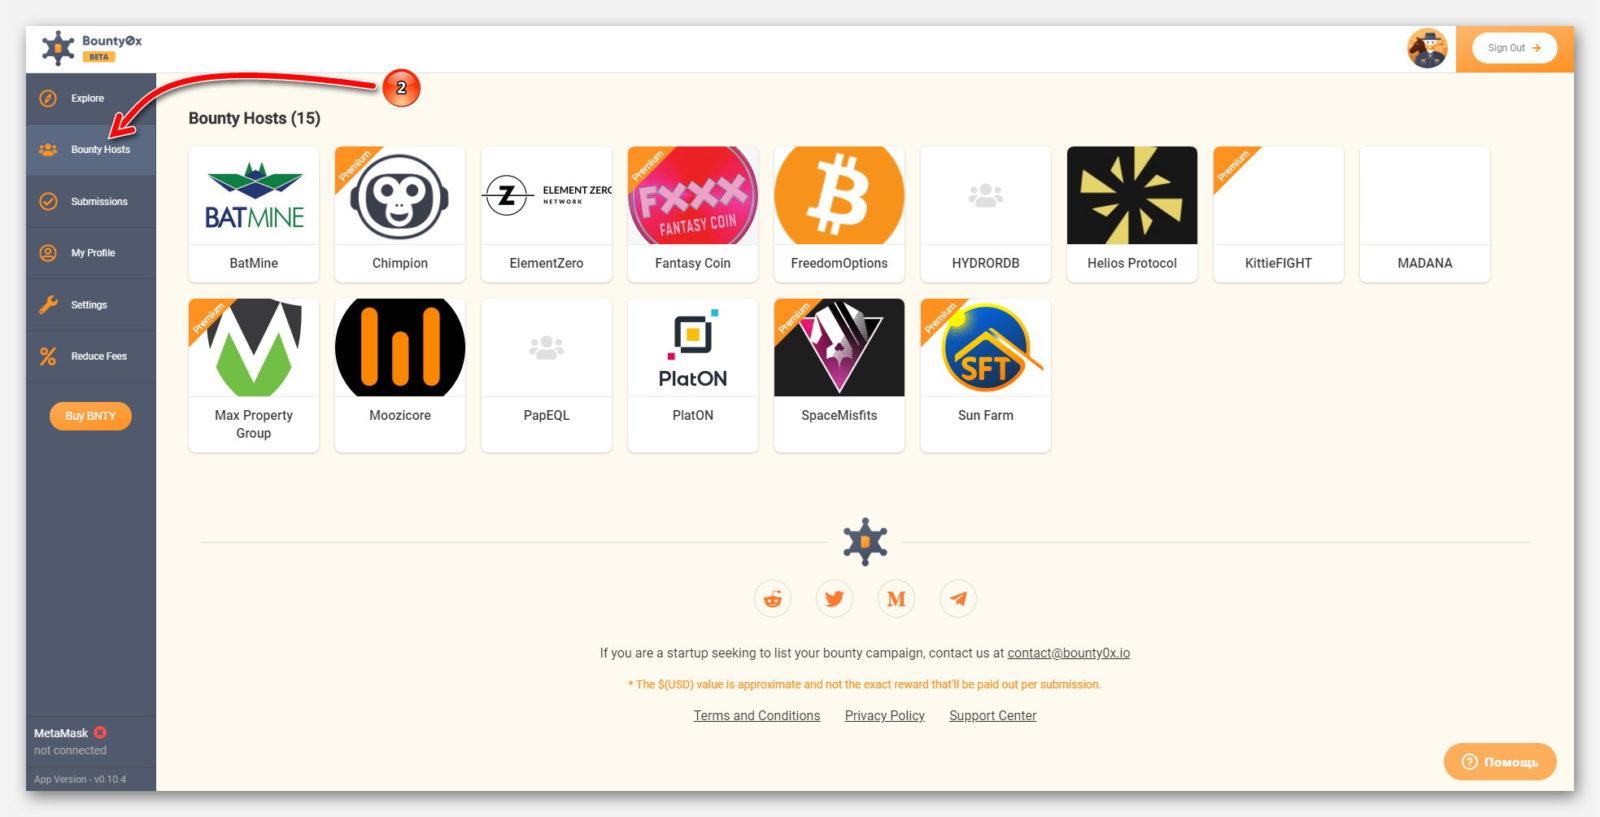 Страница с активными Bounty кампаниями, на платформе Bounty0x